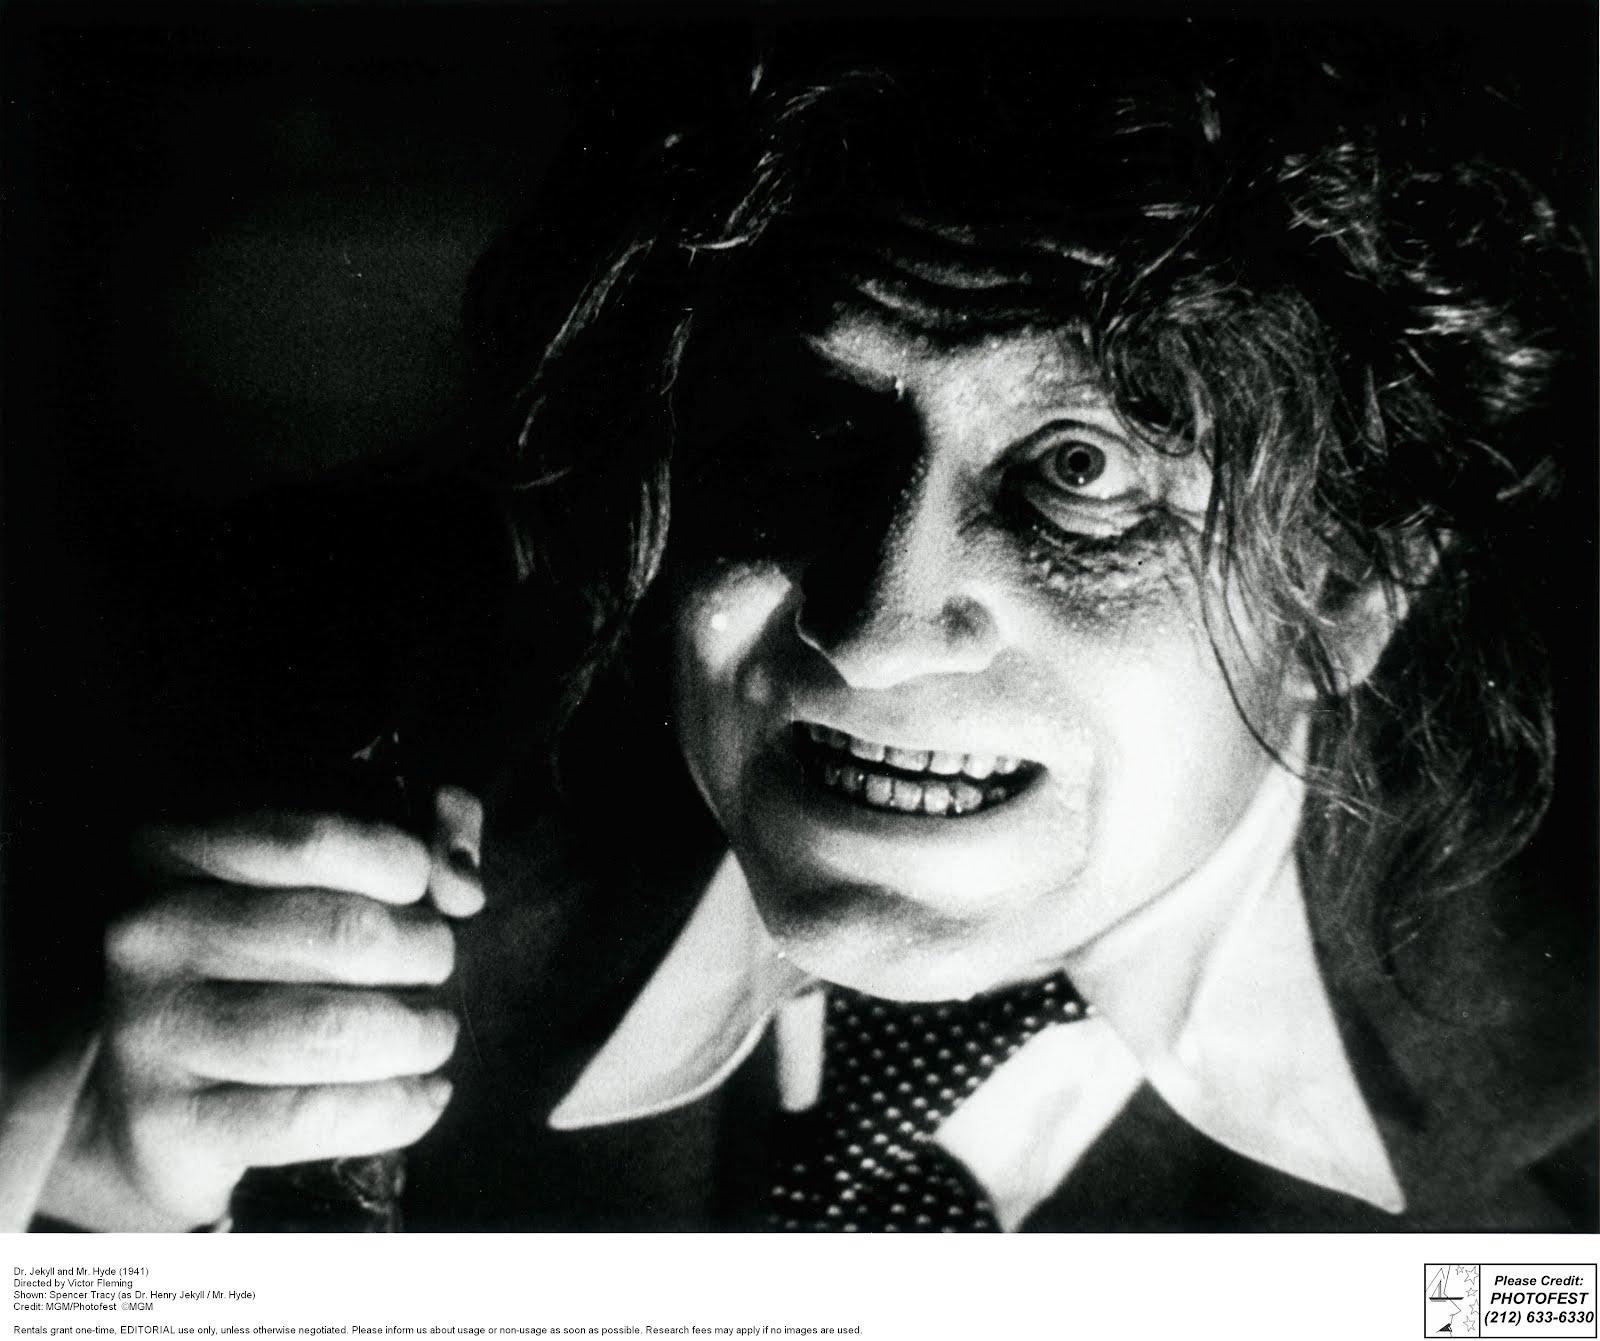 http://1.bp.blogspot.com/-5NDzLLetXBM/TzJNmniWR4I/AAAAAAAAA-w/0m4i8VNhn4Y/s1600/Dr_Jekyll_Mr_Hyde_1941_111.jpg